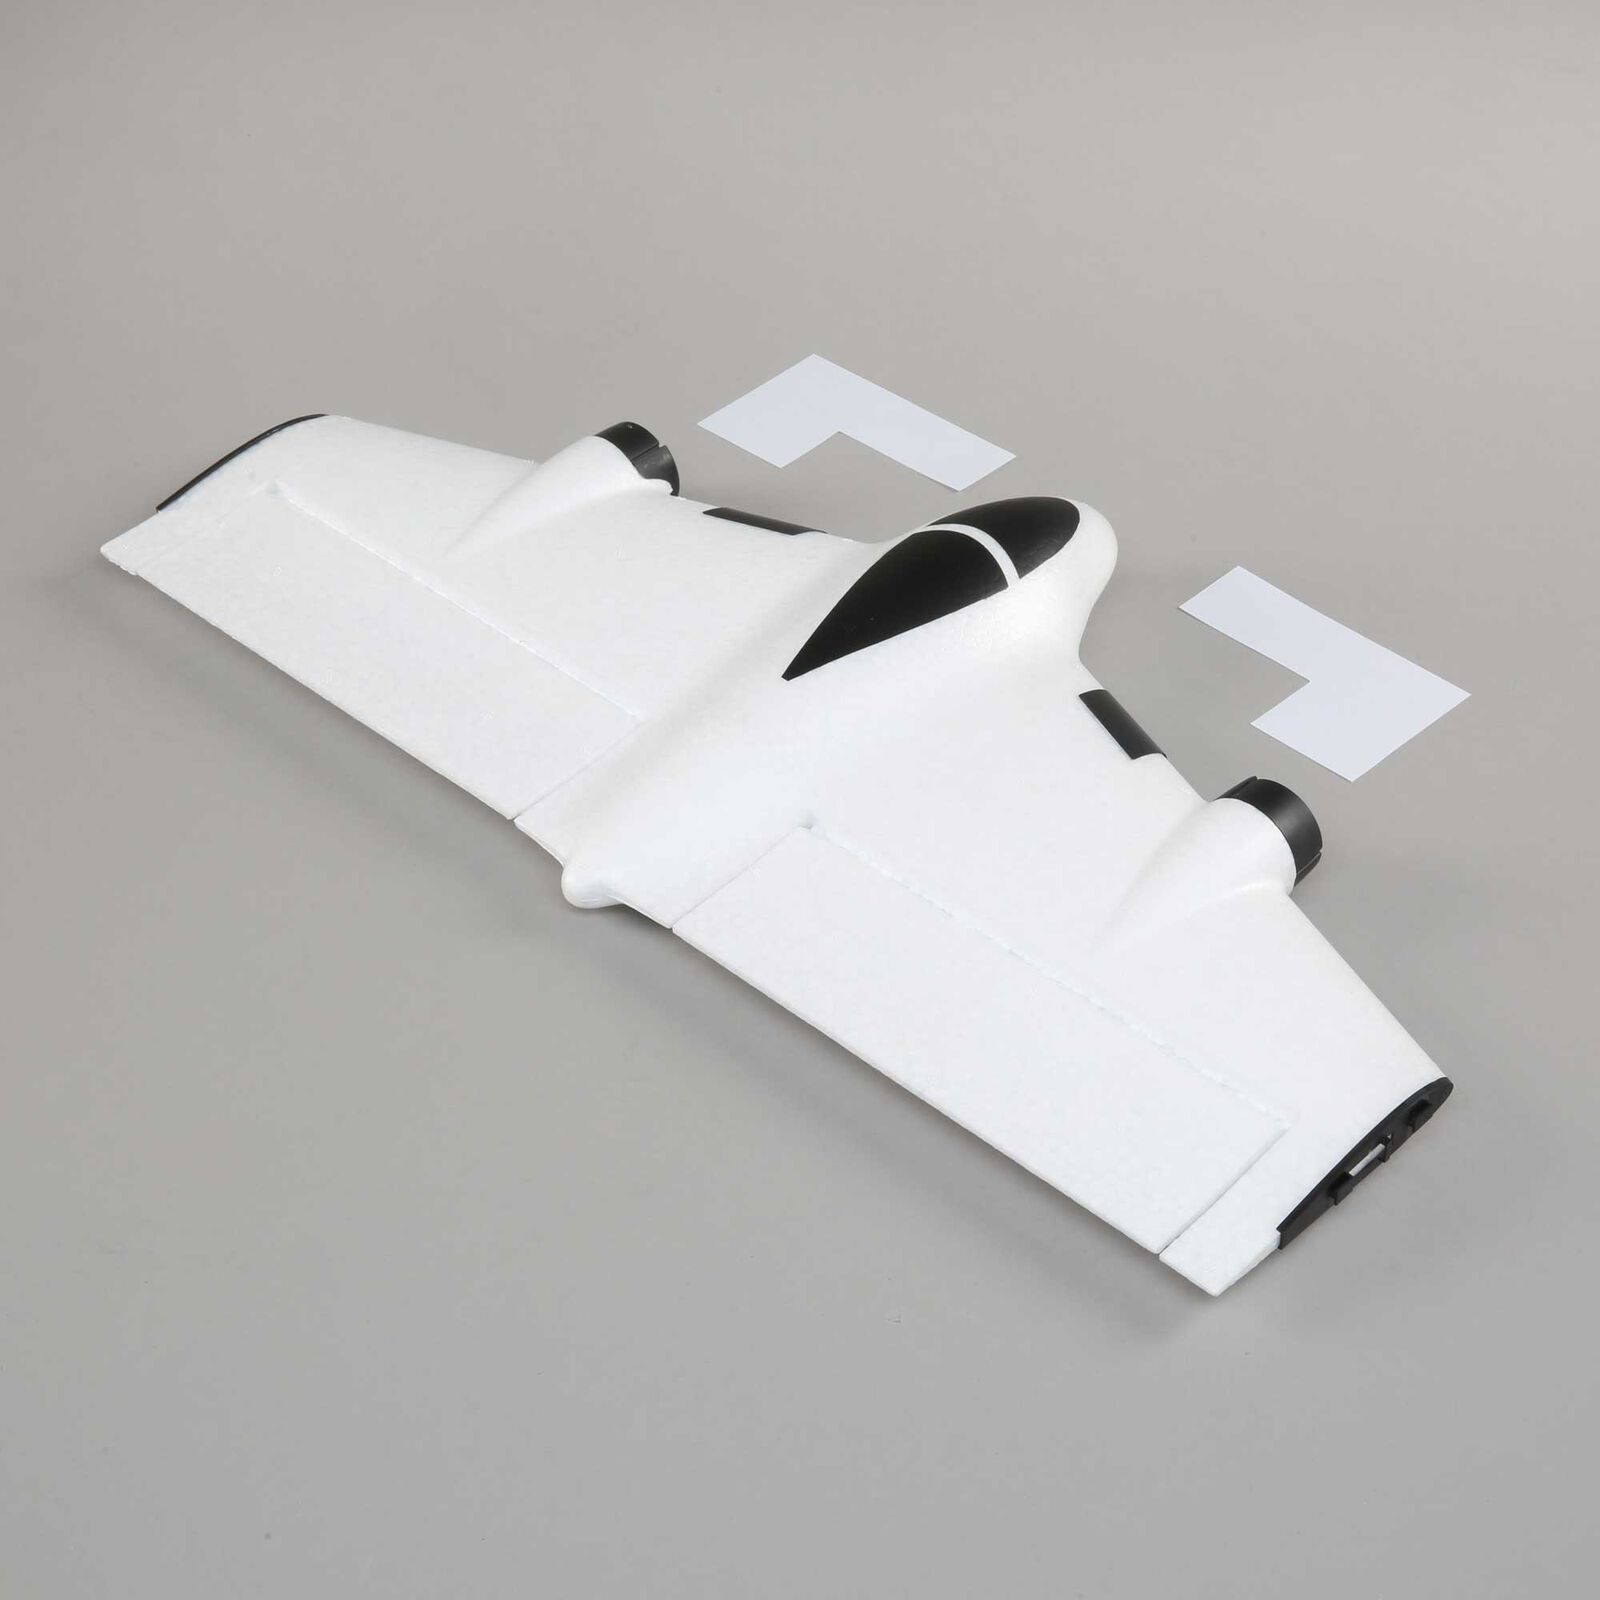 Replacement Airframe: X-VERT VTOL